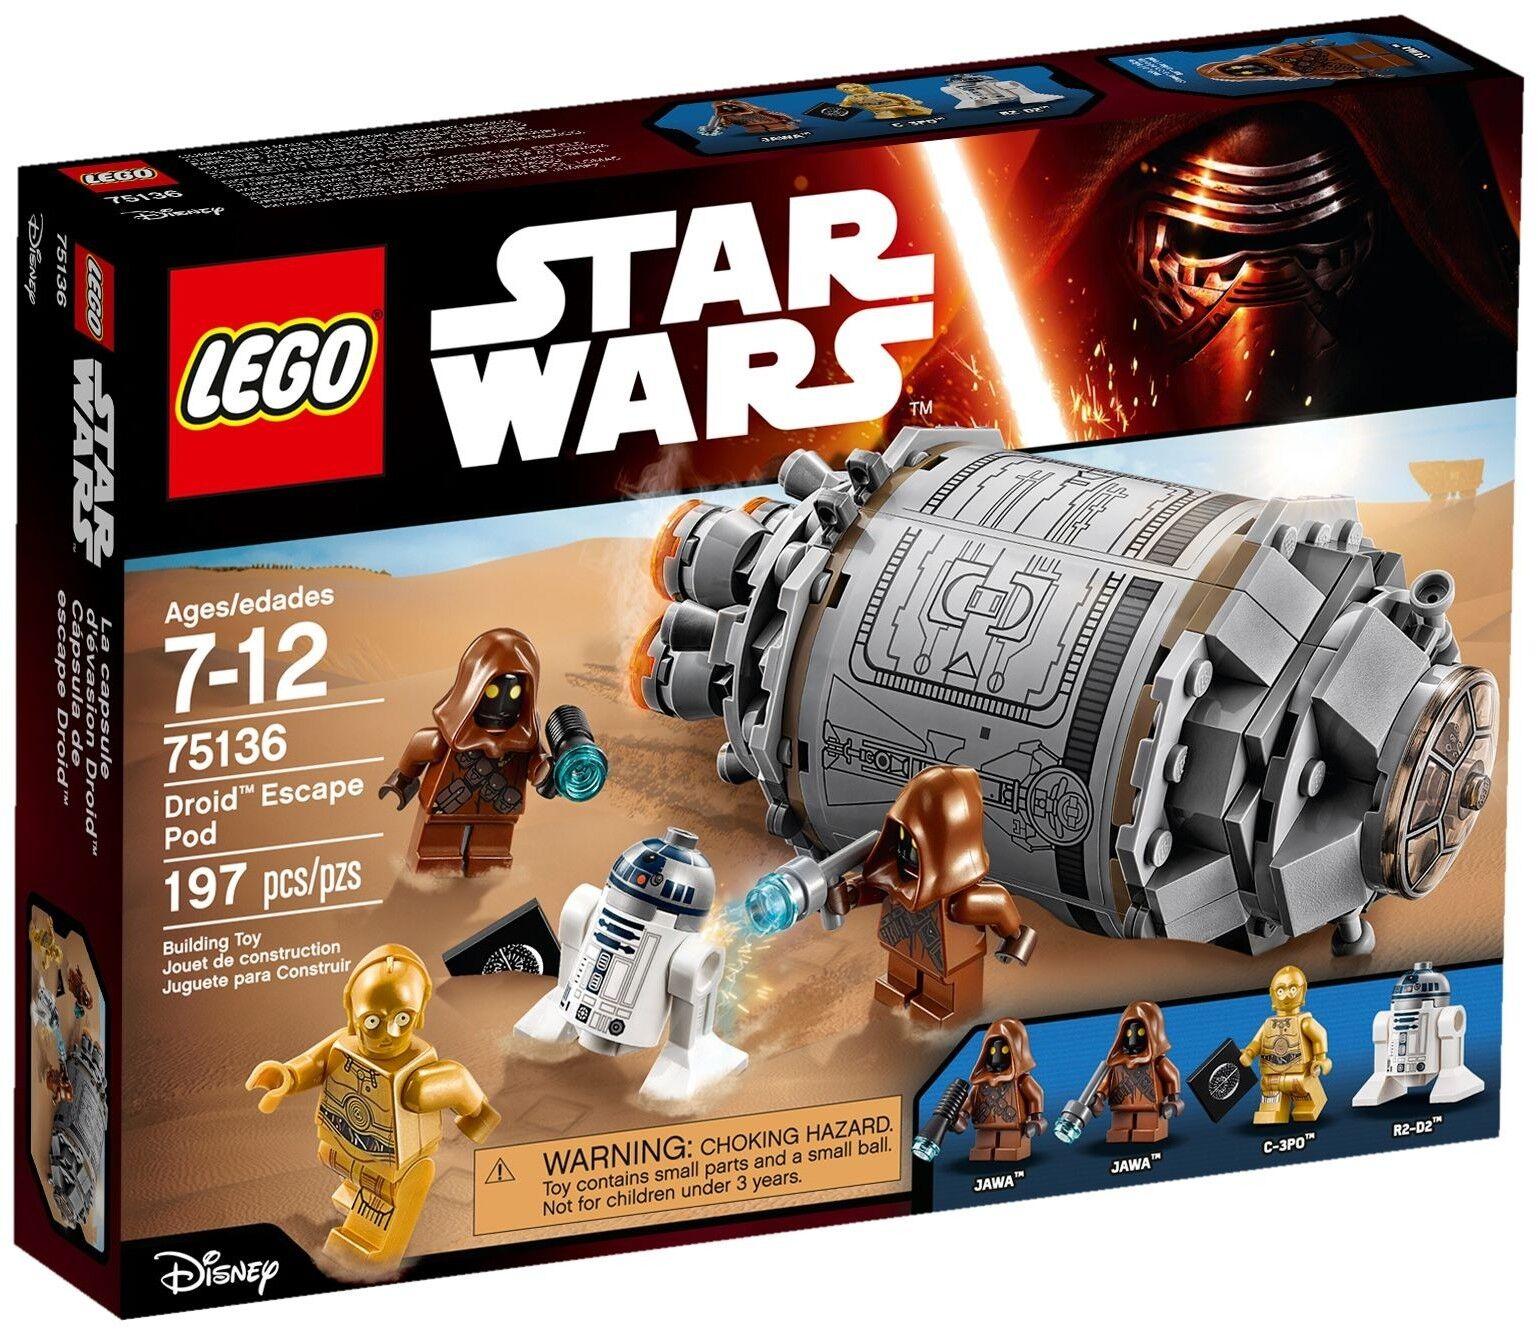 Lego 75136  Star Wars - Droid Escape Pod - Brand New Sealed Box